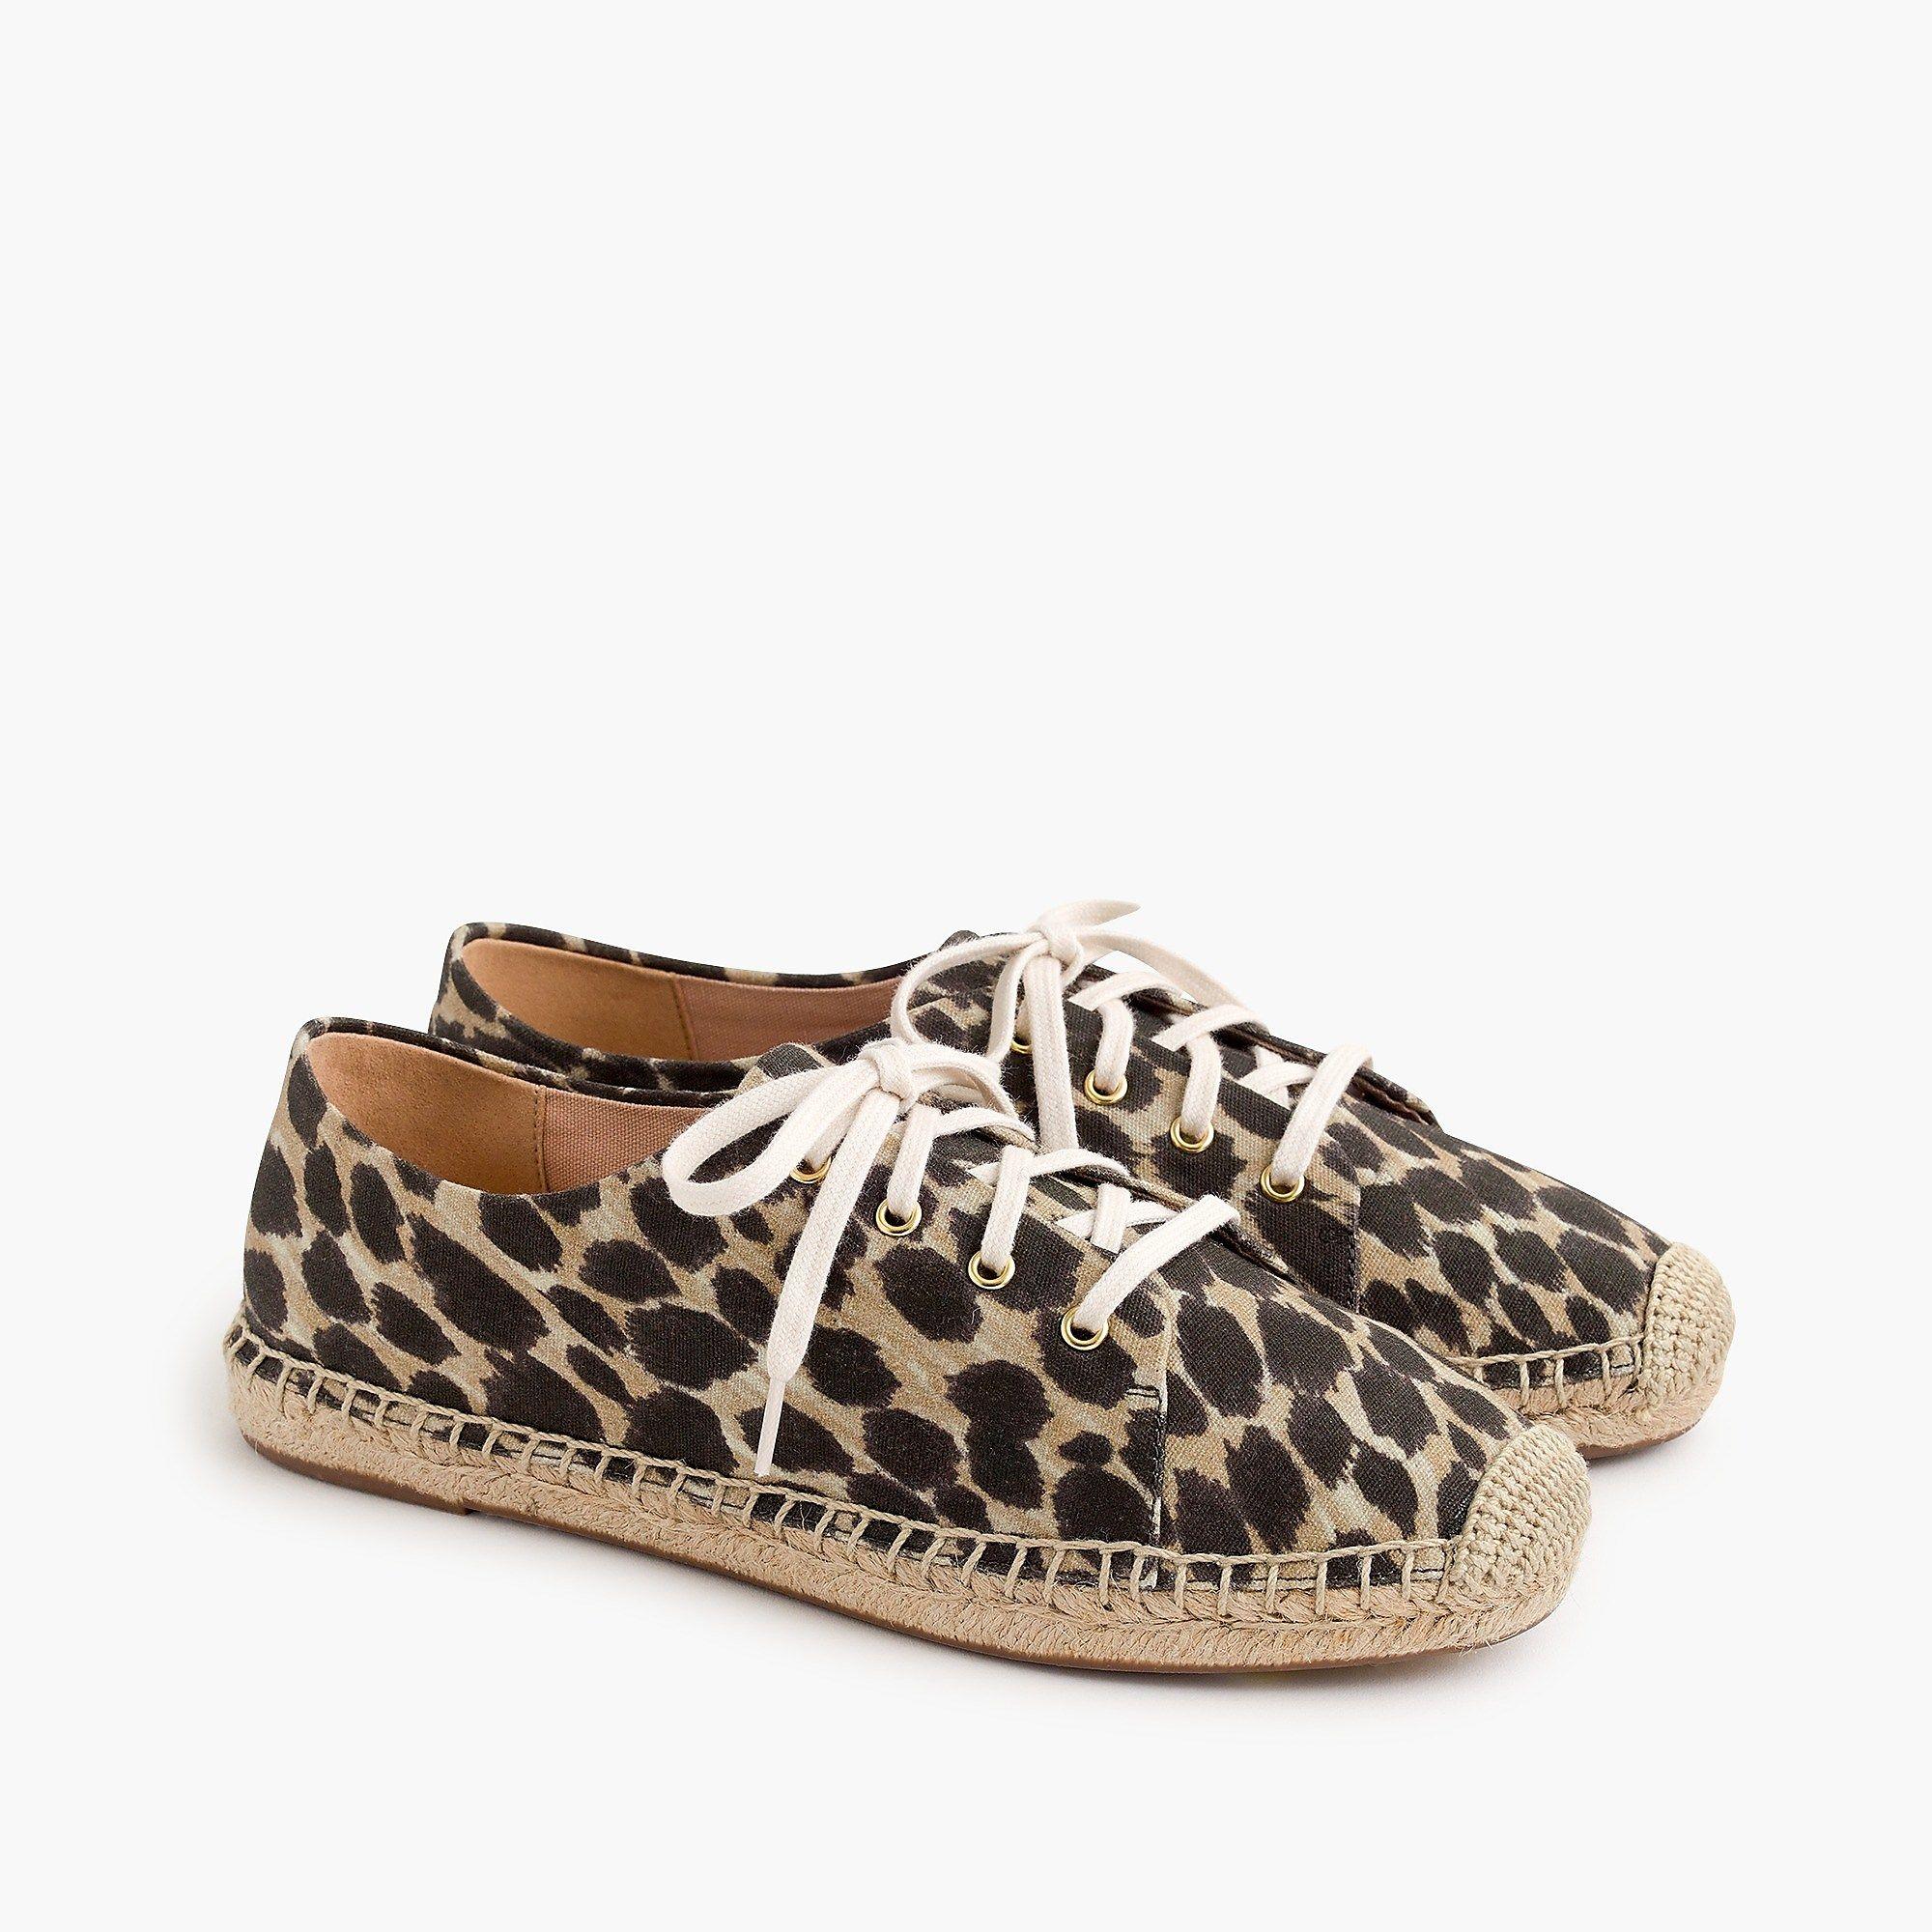 J.Crew - Lace-up espadrilles in leopard